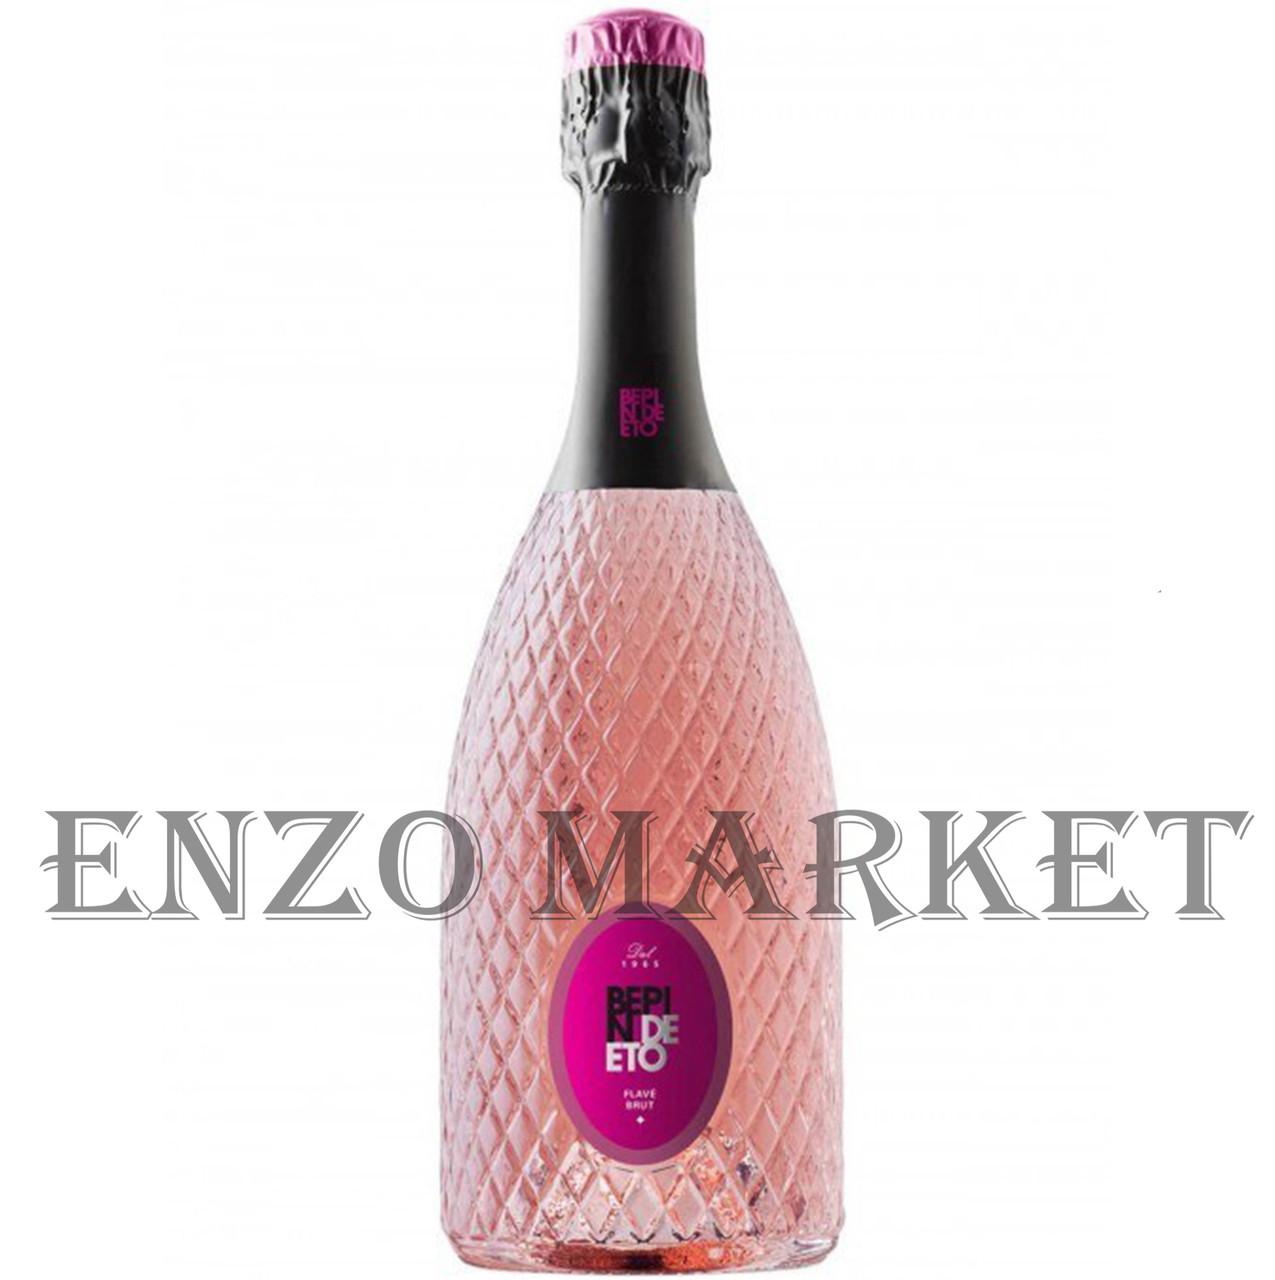 Игристое вино Bepin De Eto Flave Rose Brut (Бепин Де Ето Флаве Розе Брют) 12.5%, 0,75 литра